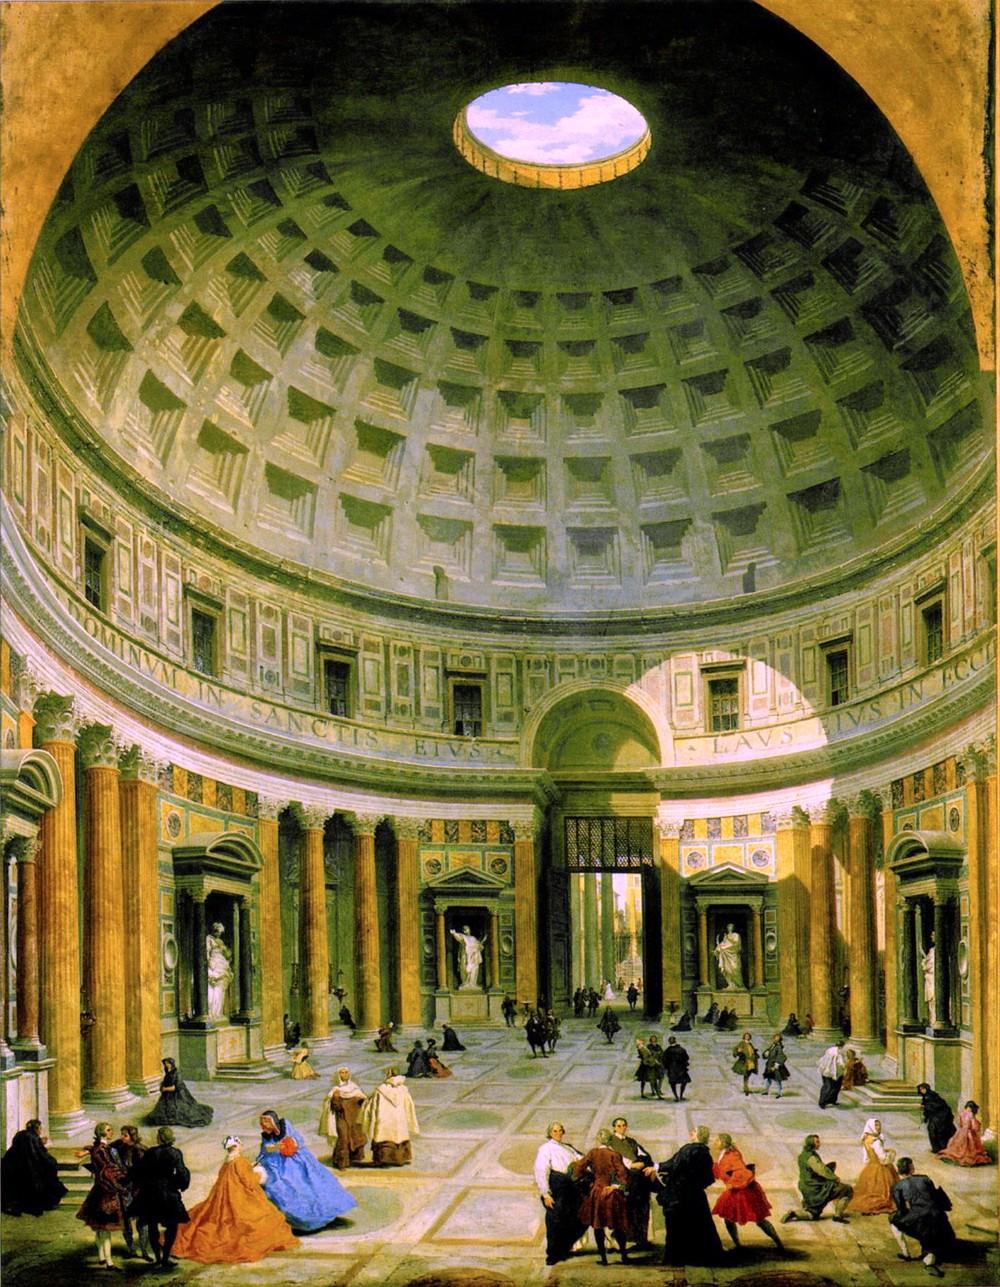 Roma, Pantheon, Giovanni Paolo Panini, 17e eeuw (internet)